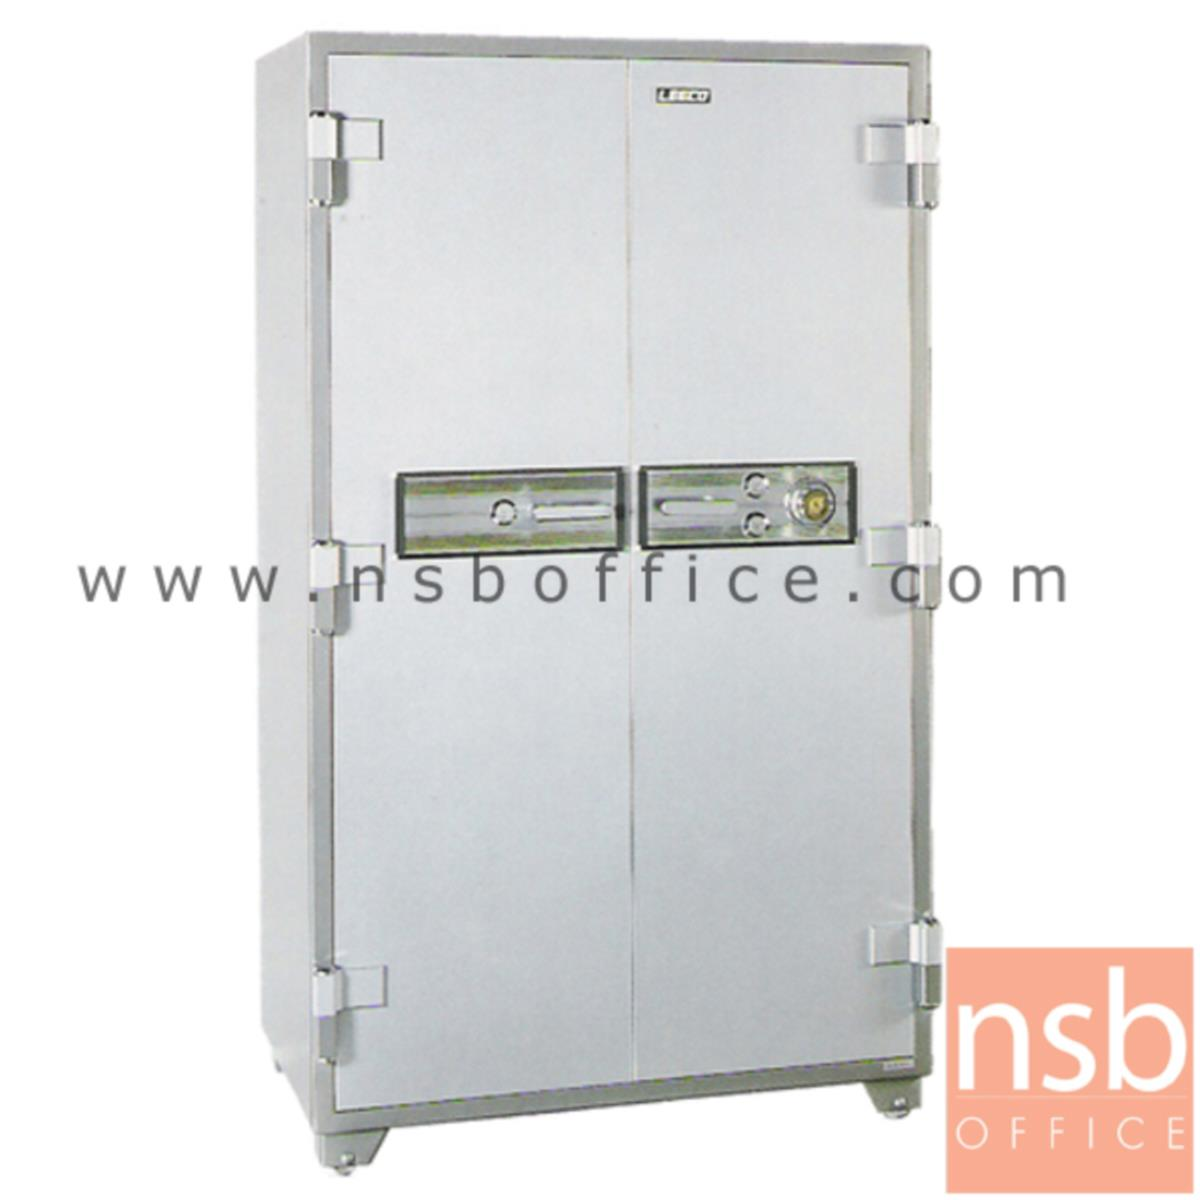 F02A056:ตู้เซฟนิรภัยแบบบานเปิดคู่ 2D-203 น้ำหนัก 640 kg.